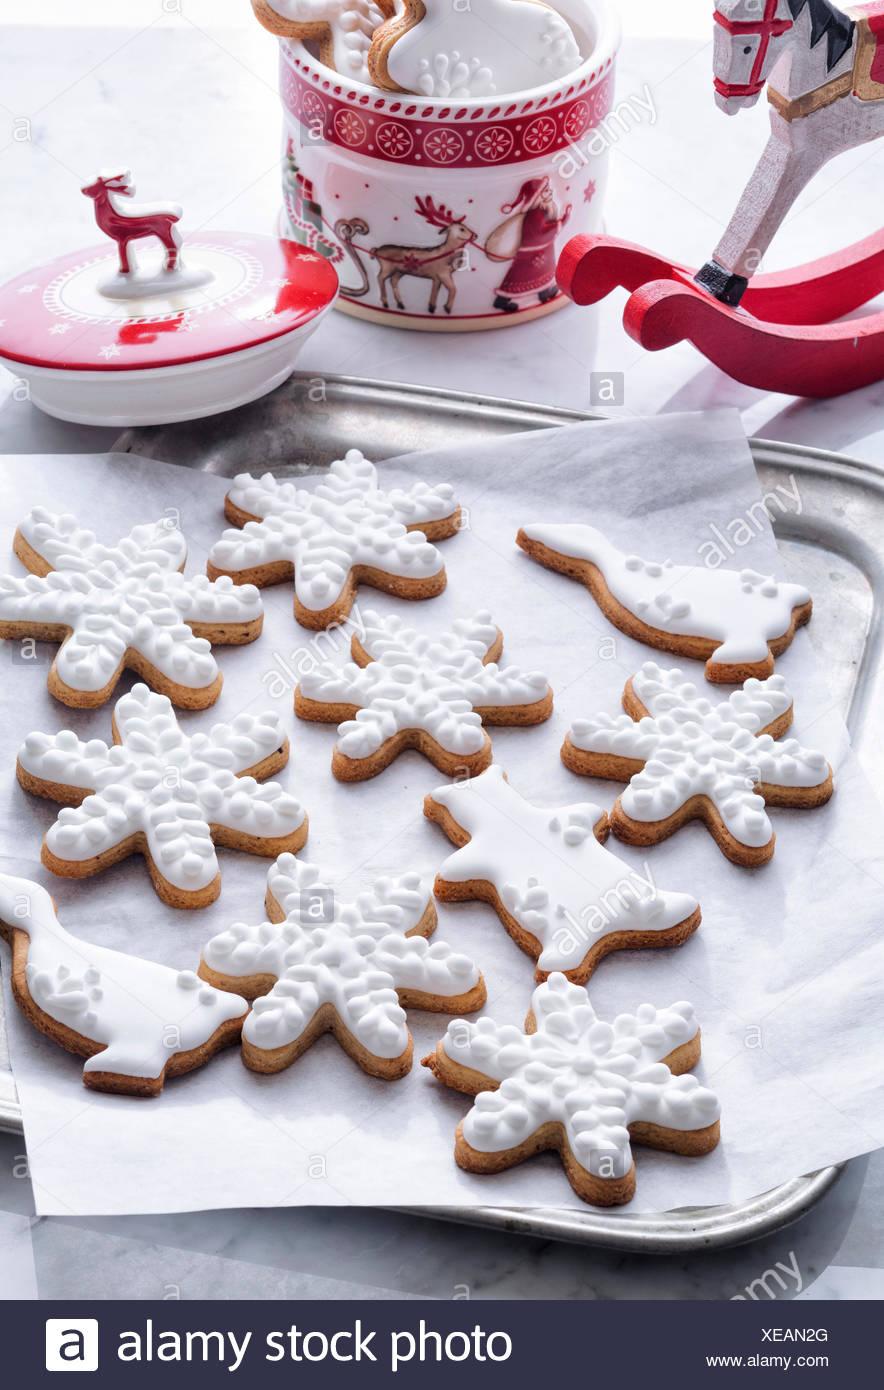 Classic Christmas Cookies On Sheet Pan Stock Photo 284207128 Alamy